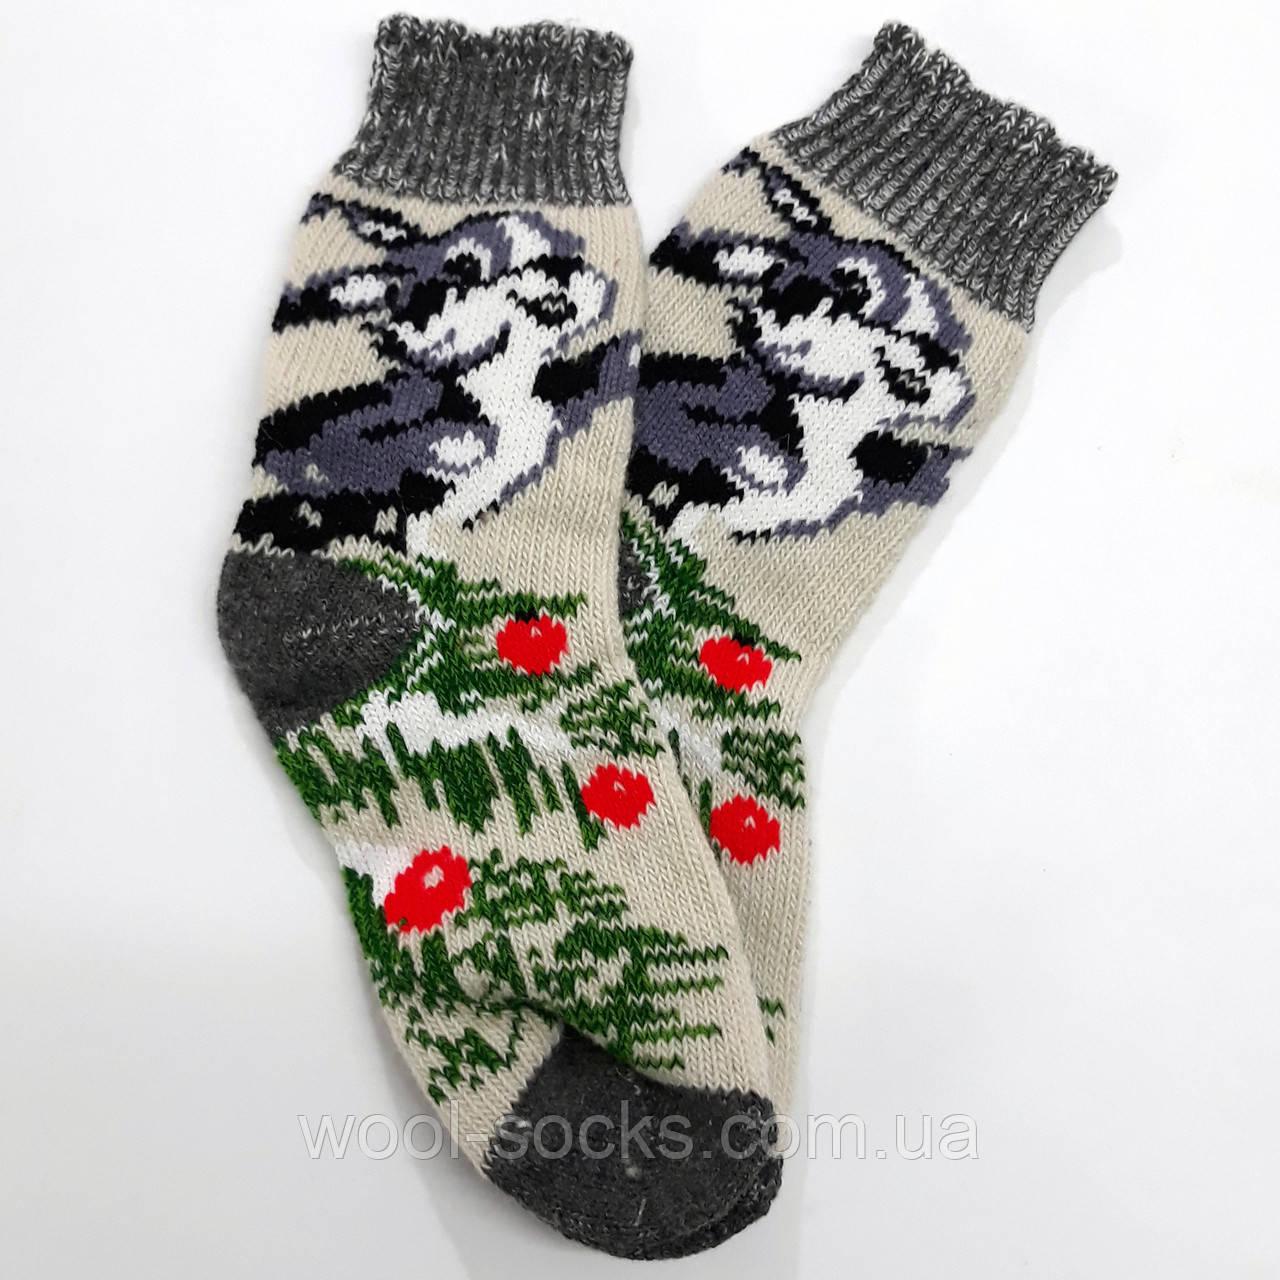 Носки зимние теплые